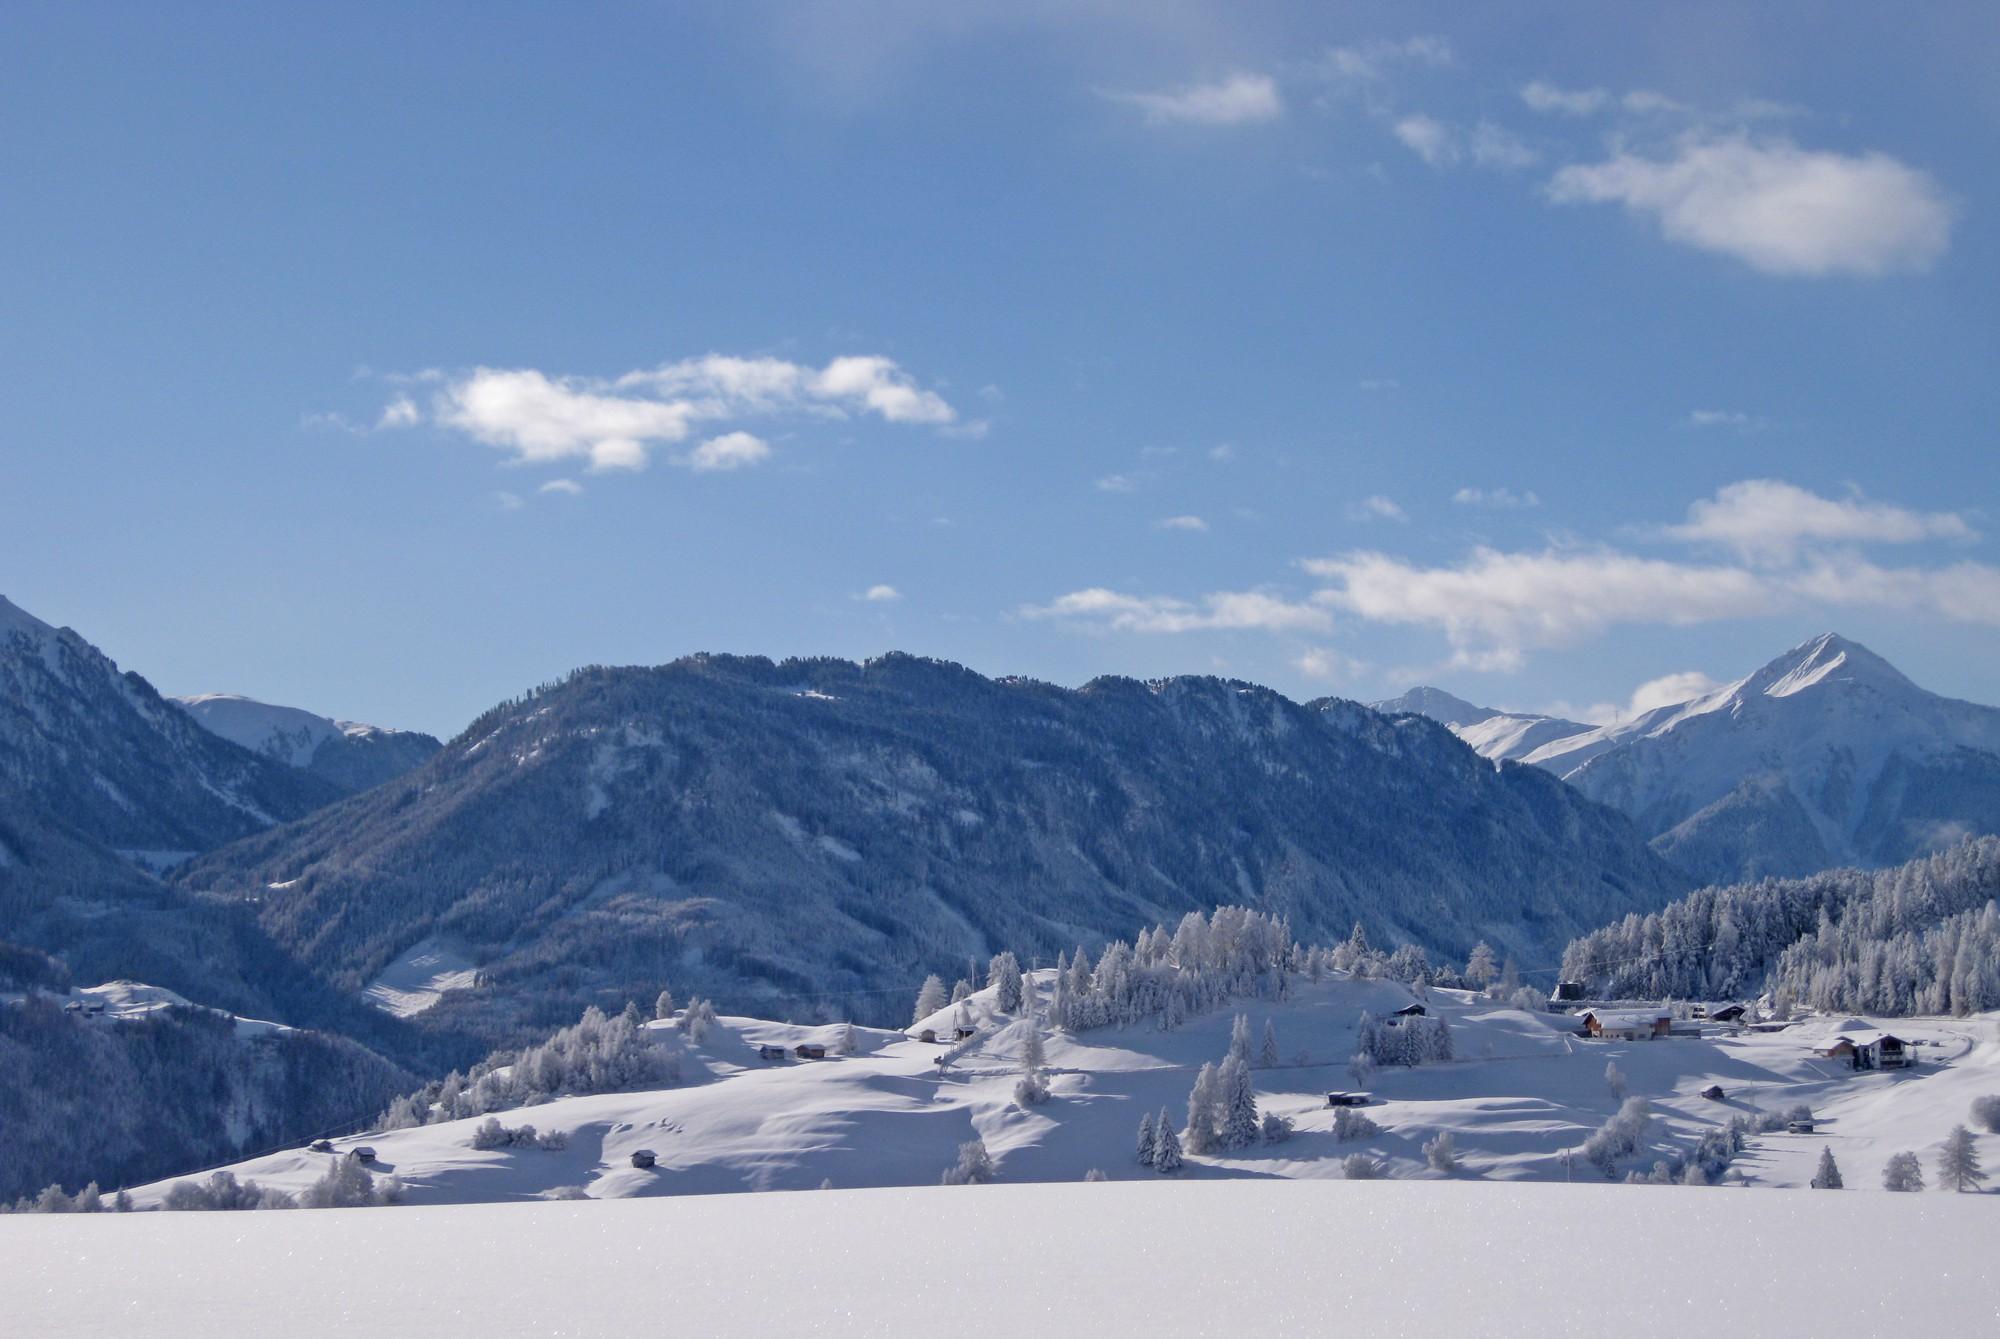 Serfaus-Fiss-Ladis Winter